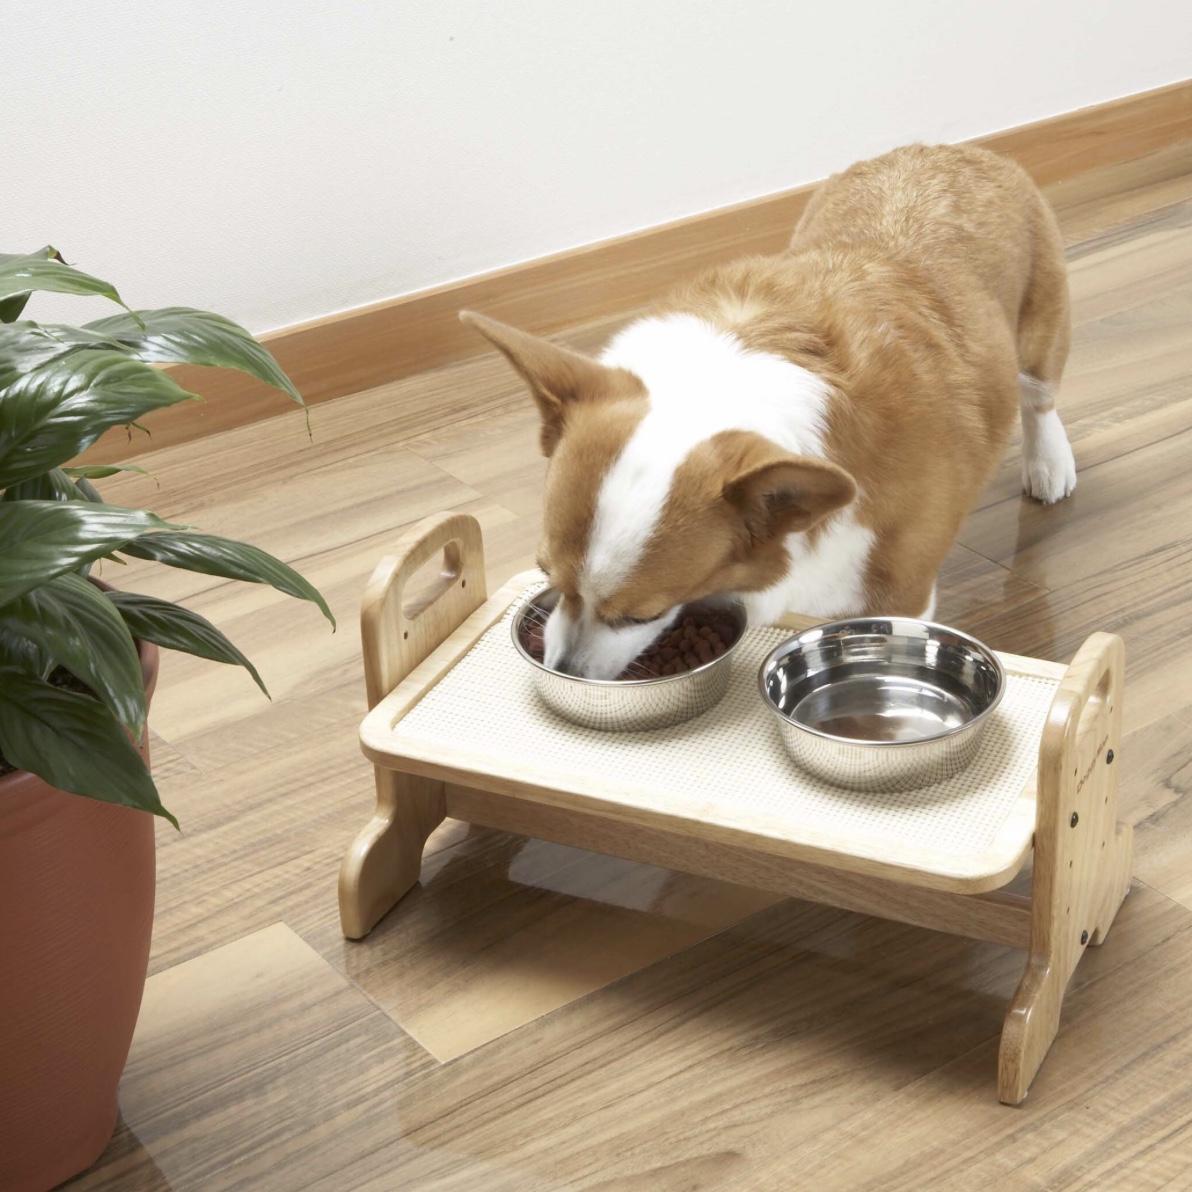 Bàn Ăn Cho Cún Mèo DoggyMan [Size M 42x26x22cm]